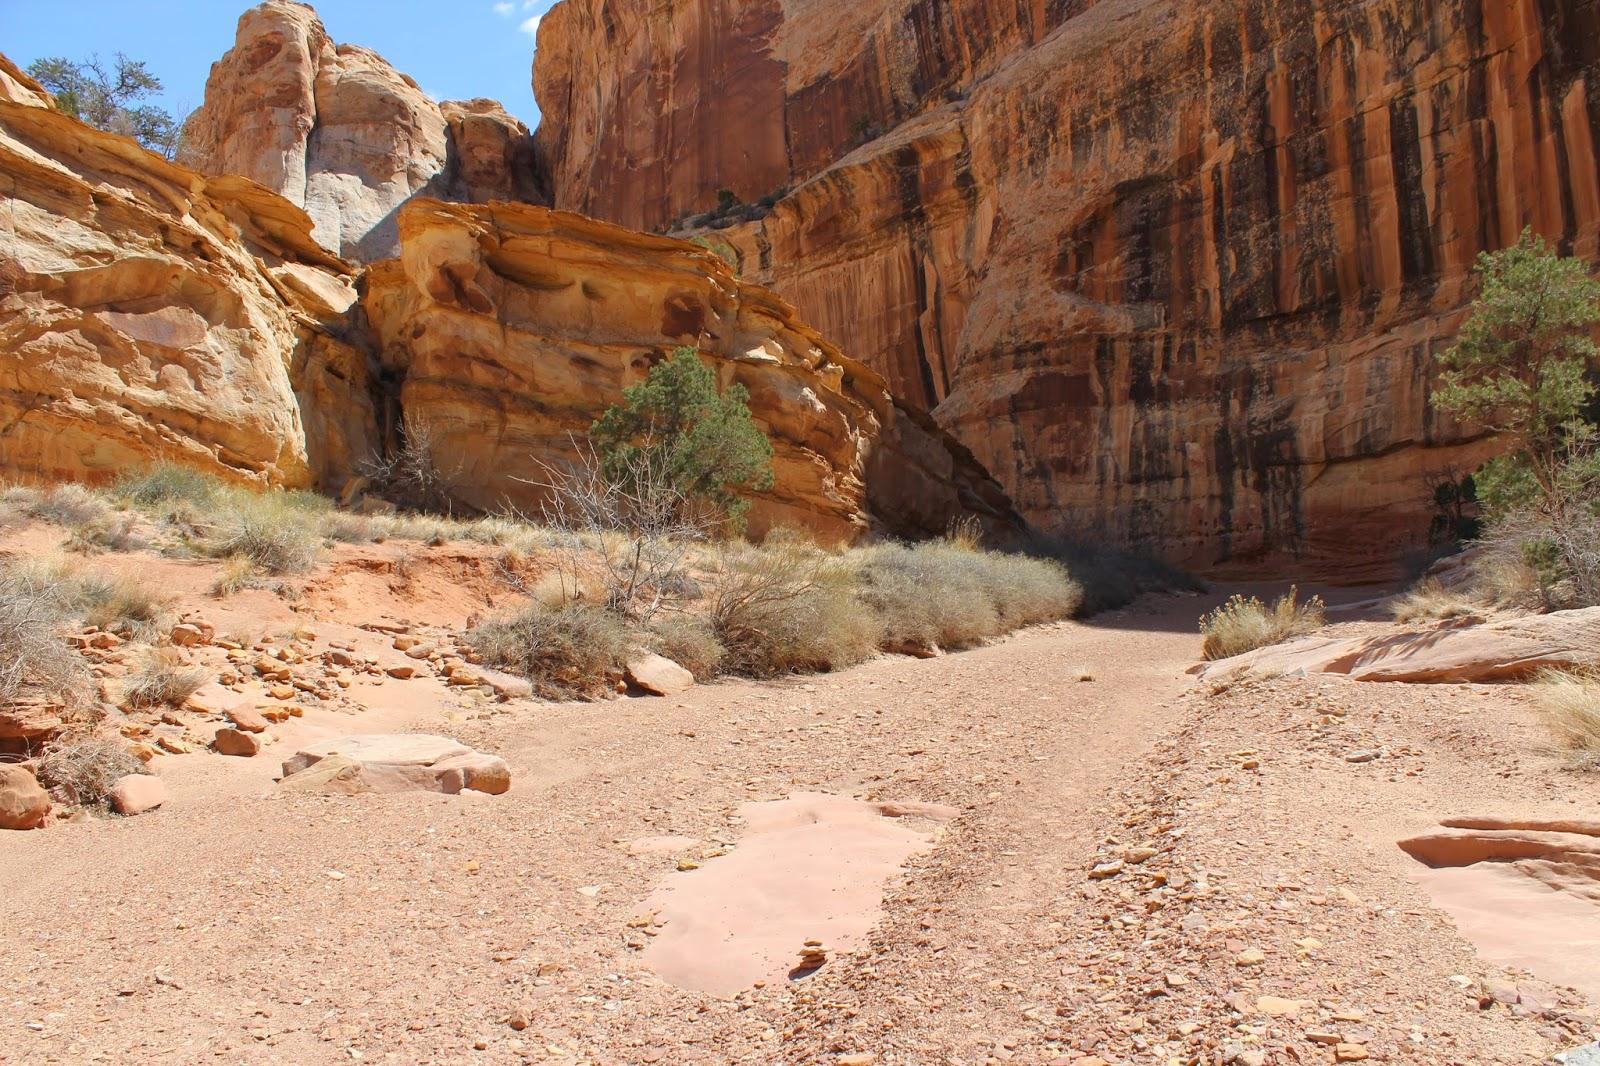 Gjhikescom Wildhorse Canyon